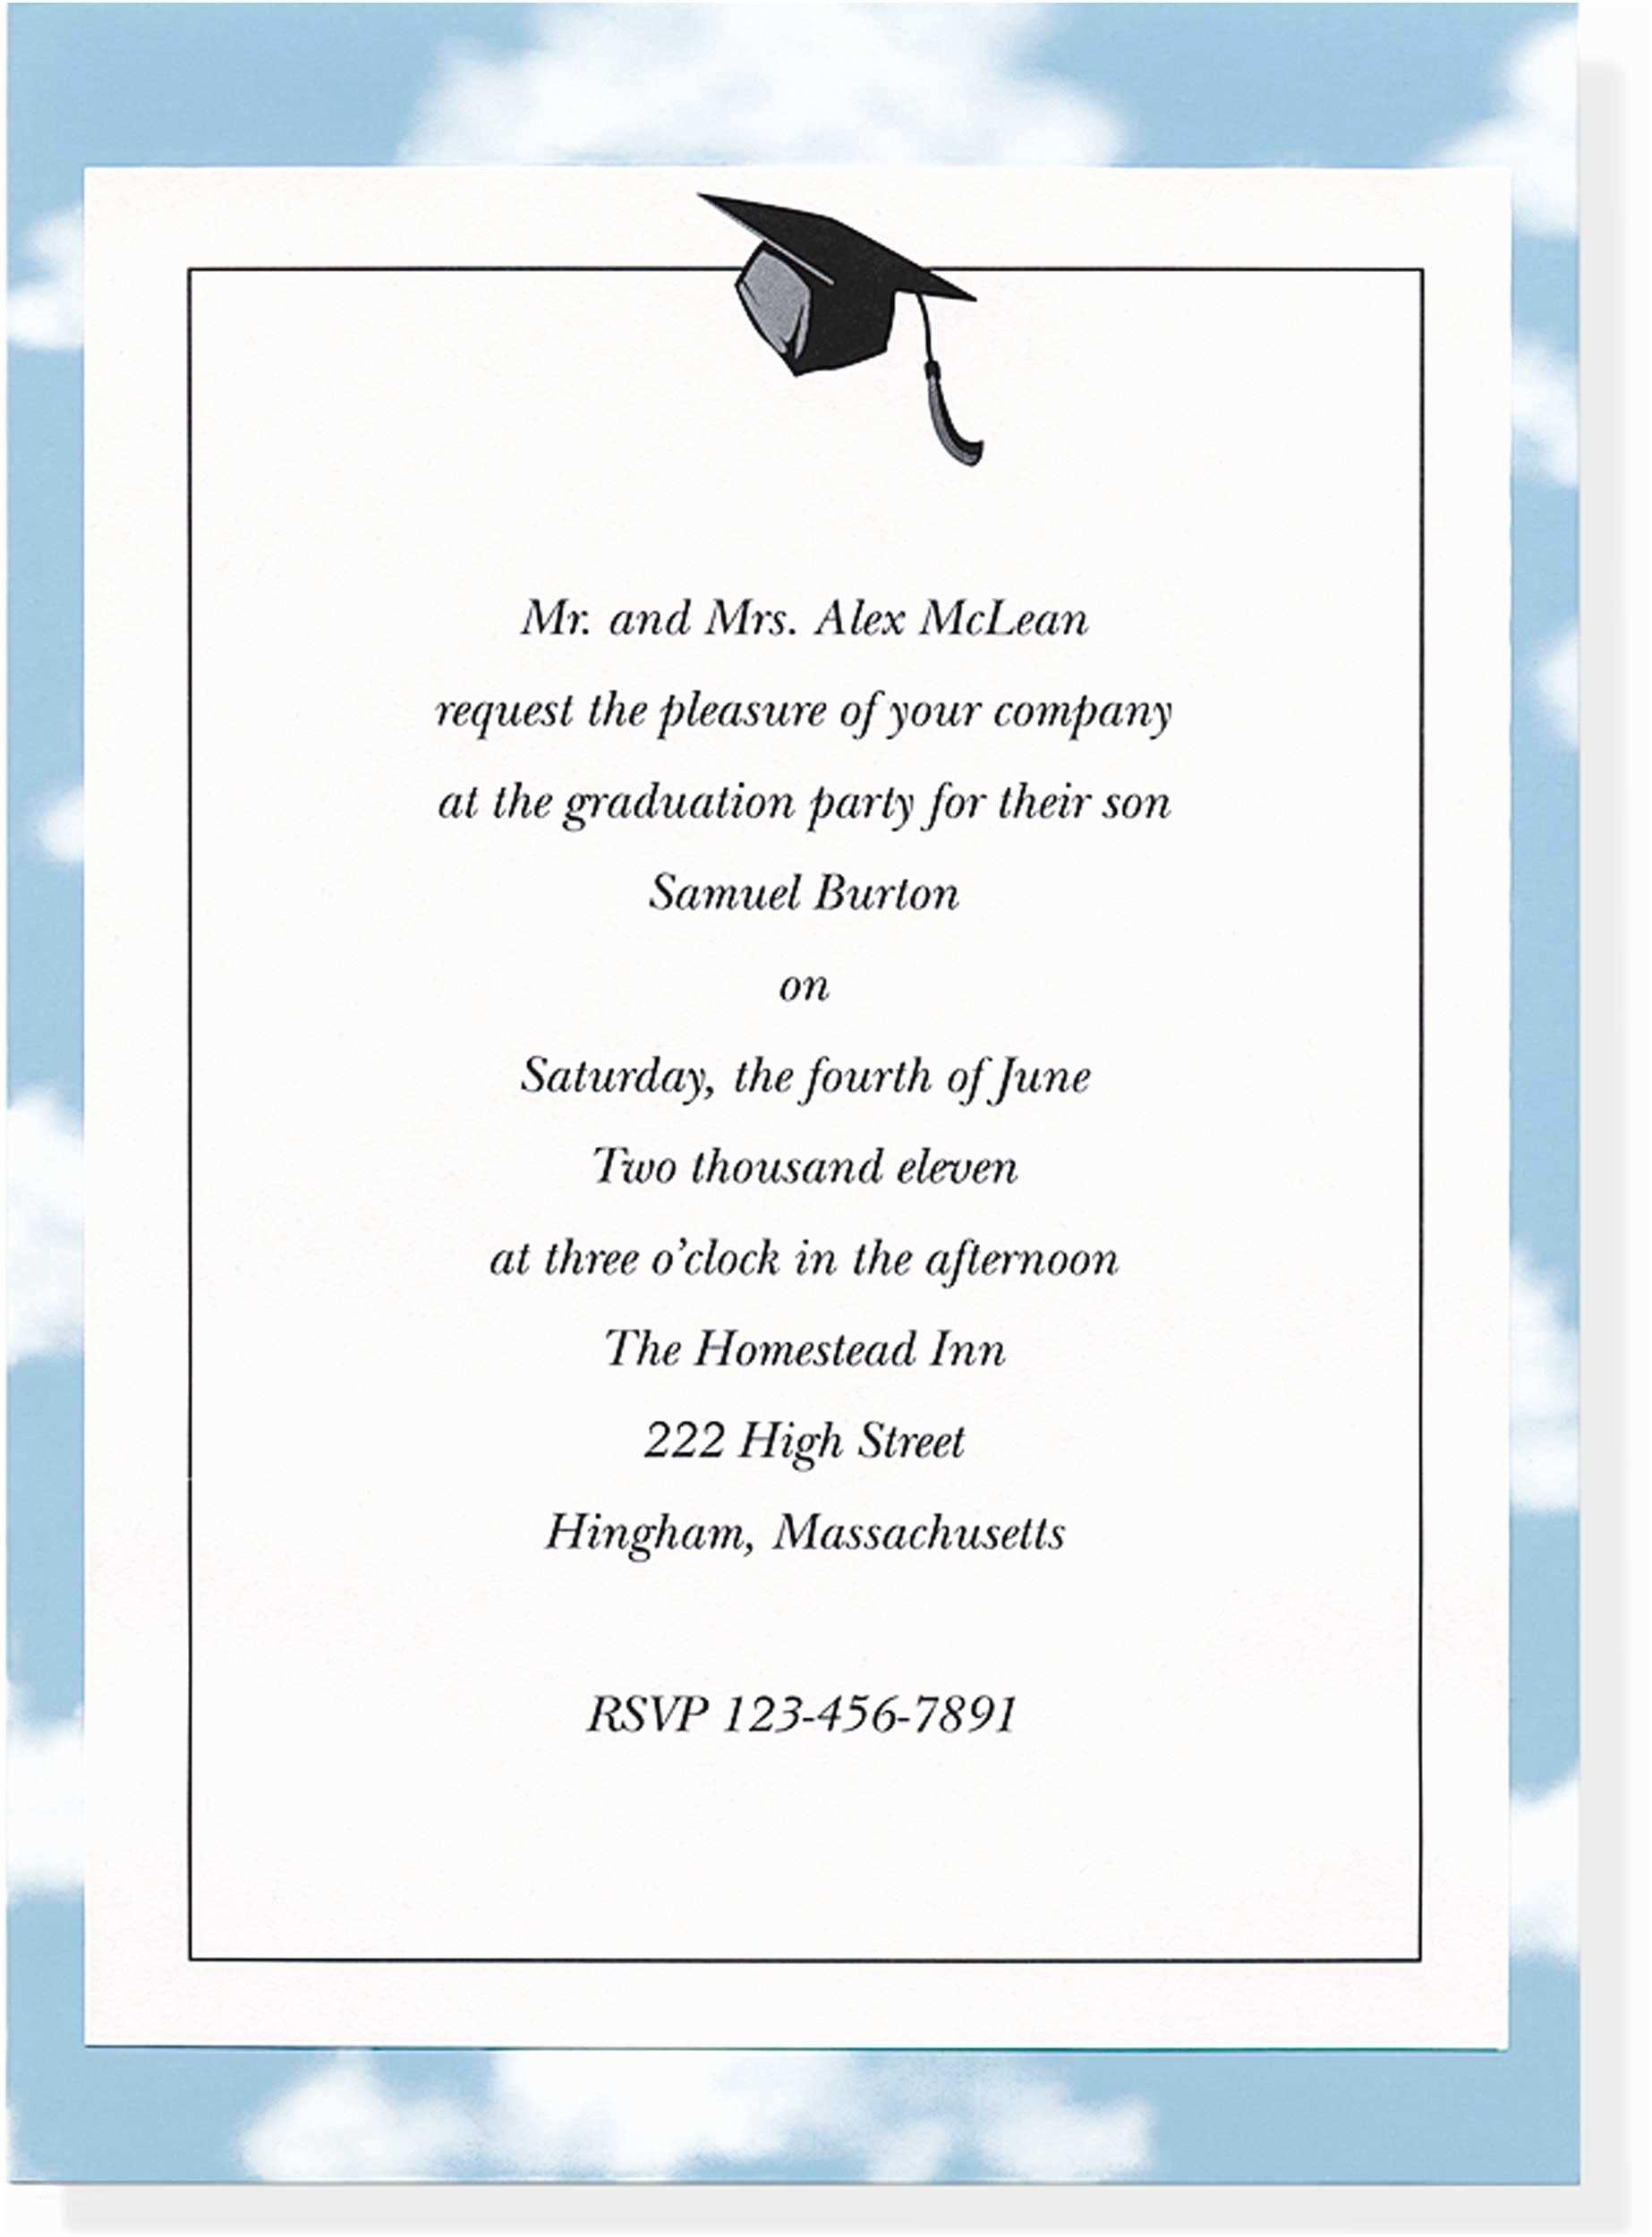 Sample Graduation Invitation Sample Invitations for Graduation Brown Wedding and